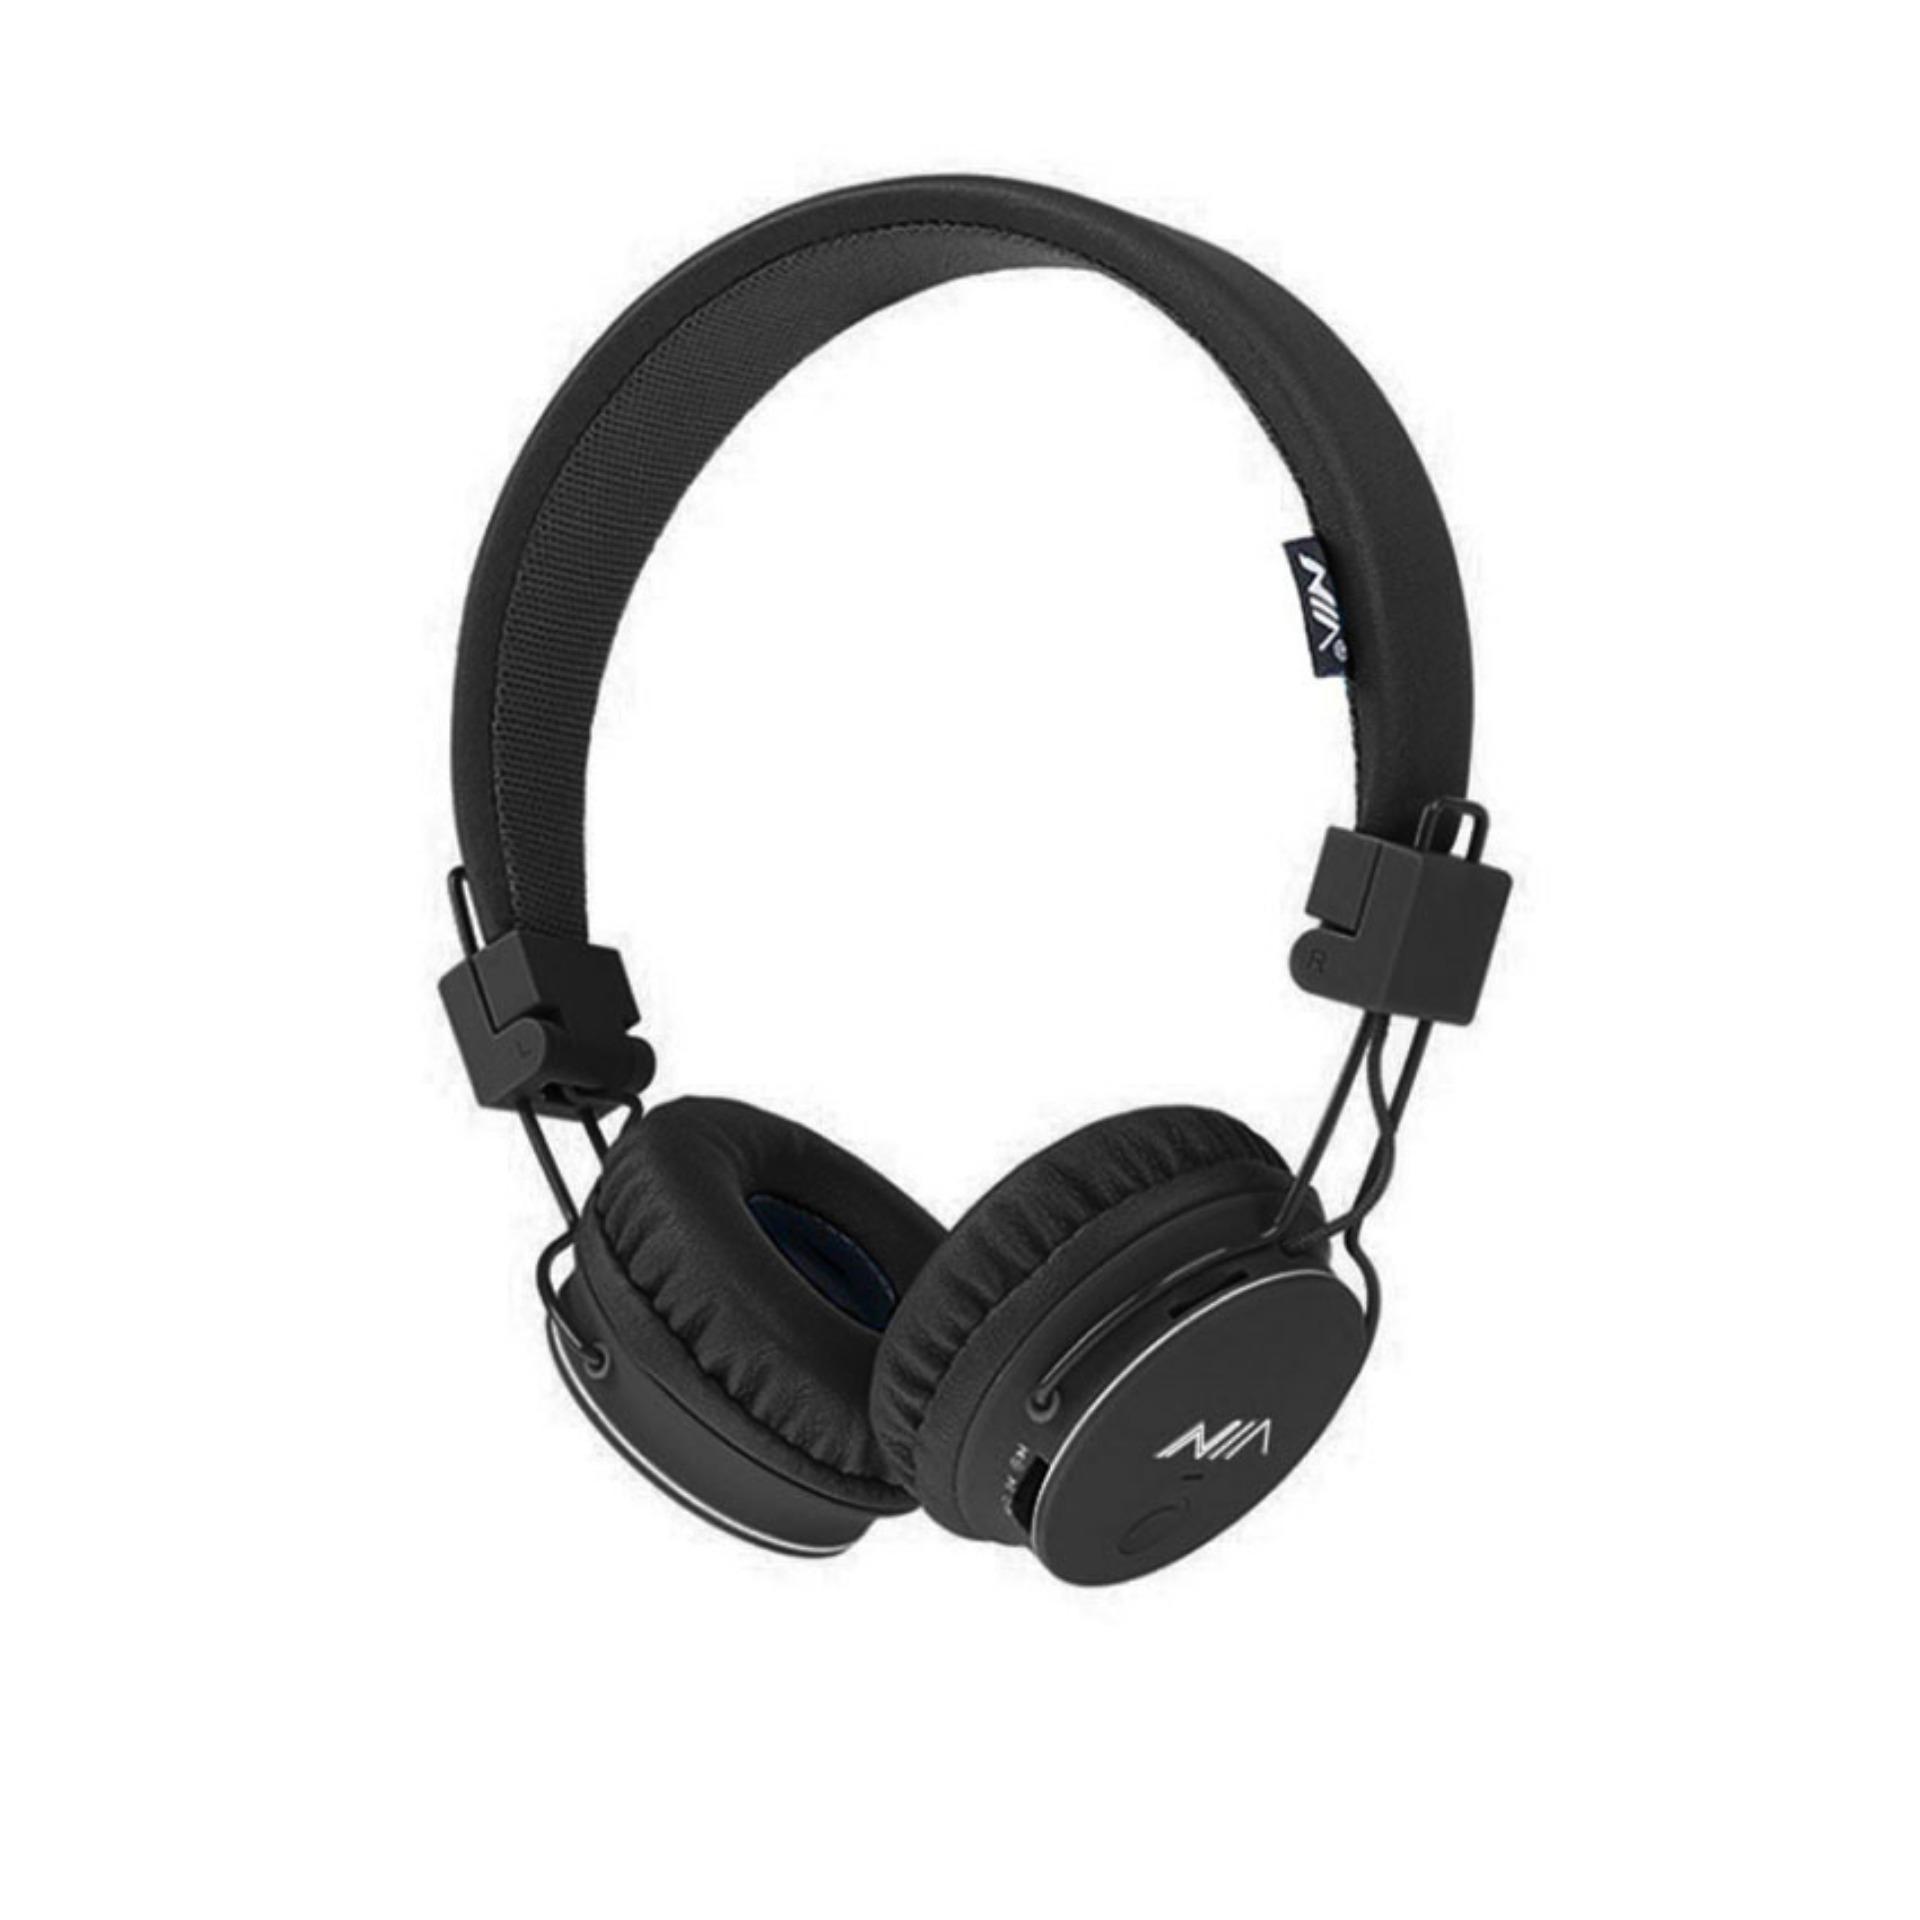 Philippines Best Buy Audio Be 04 08 2018 Multimedia Speaker Bluetooth Subwoofer Jt 909 Nia X3 108db 4 In 1 Wireless Over Ear Headphone Black